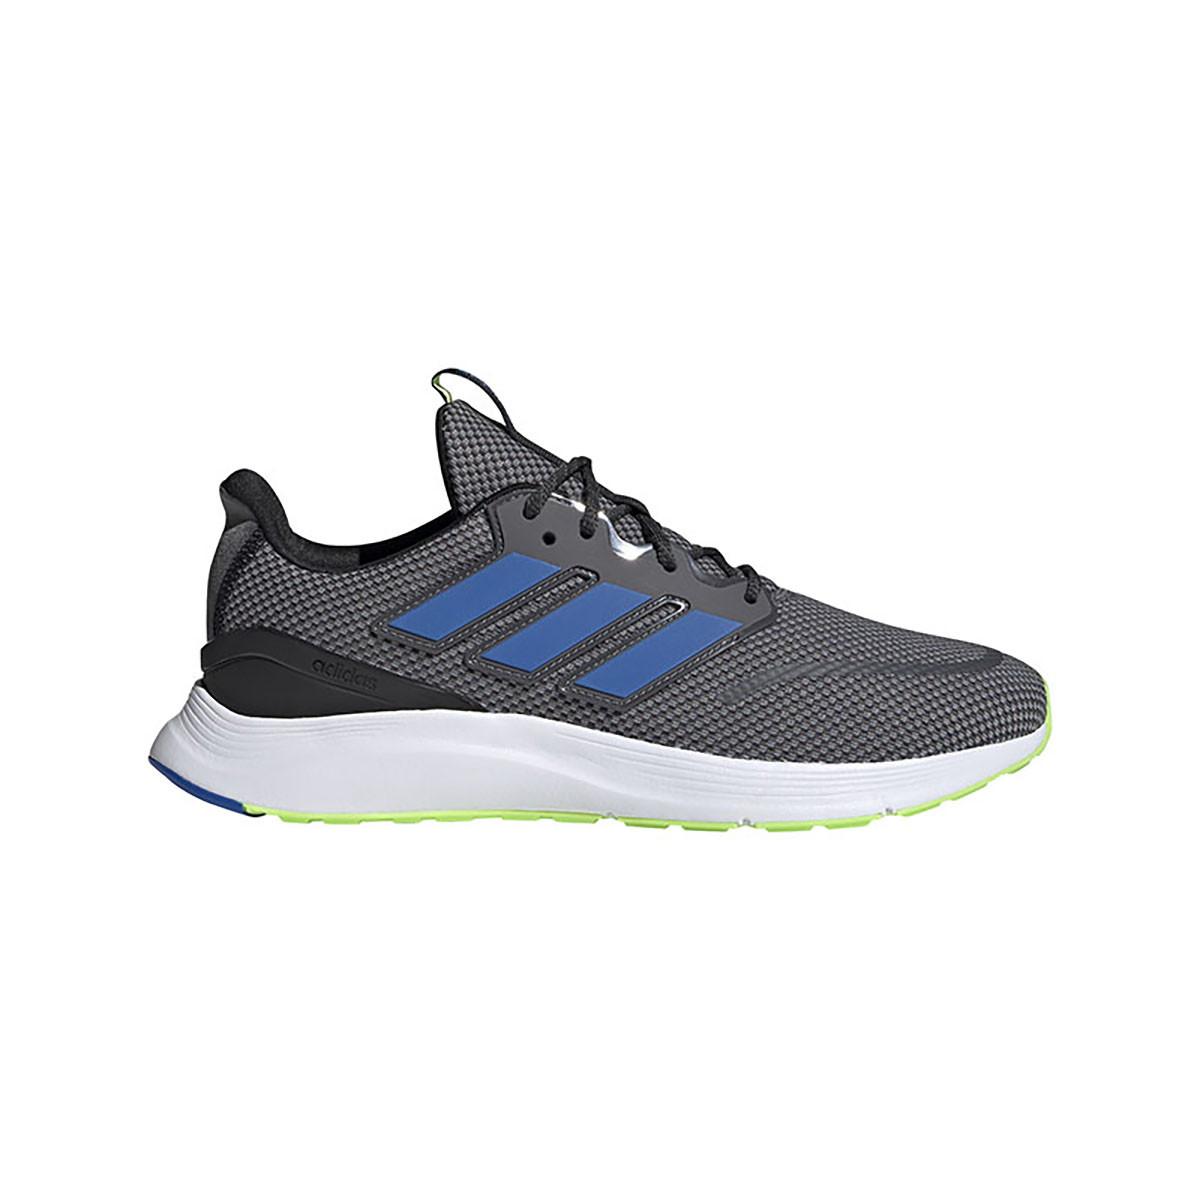 adidas 阿迪达斯 ENERGY FALCON EG8392 男士跑鞋